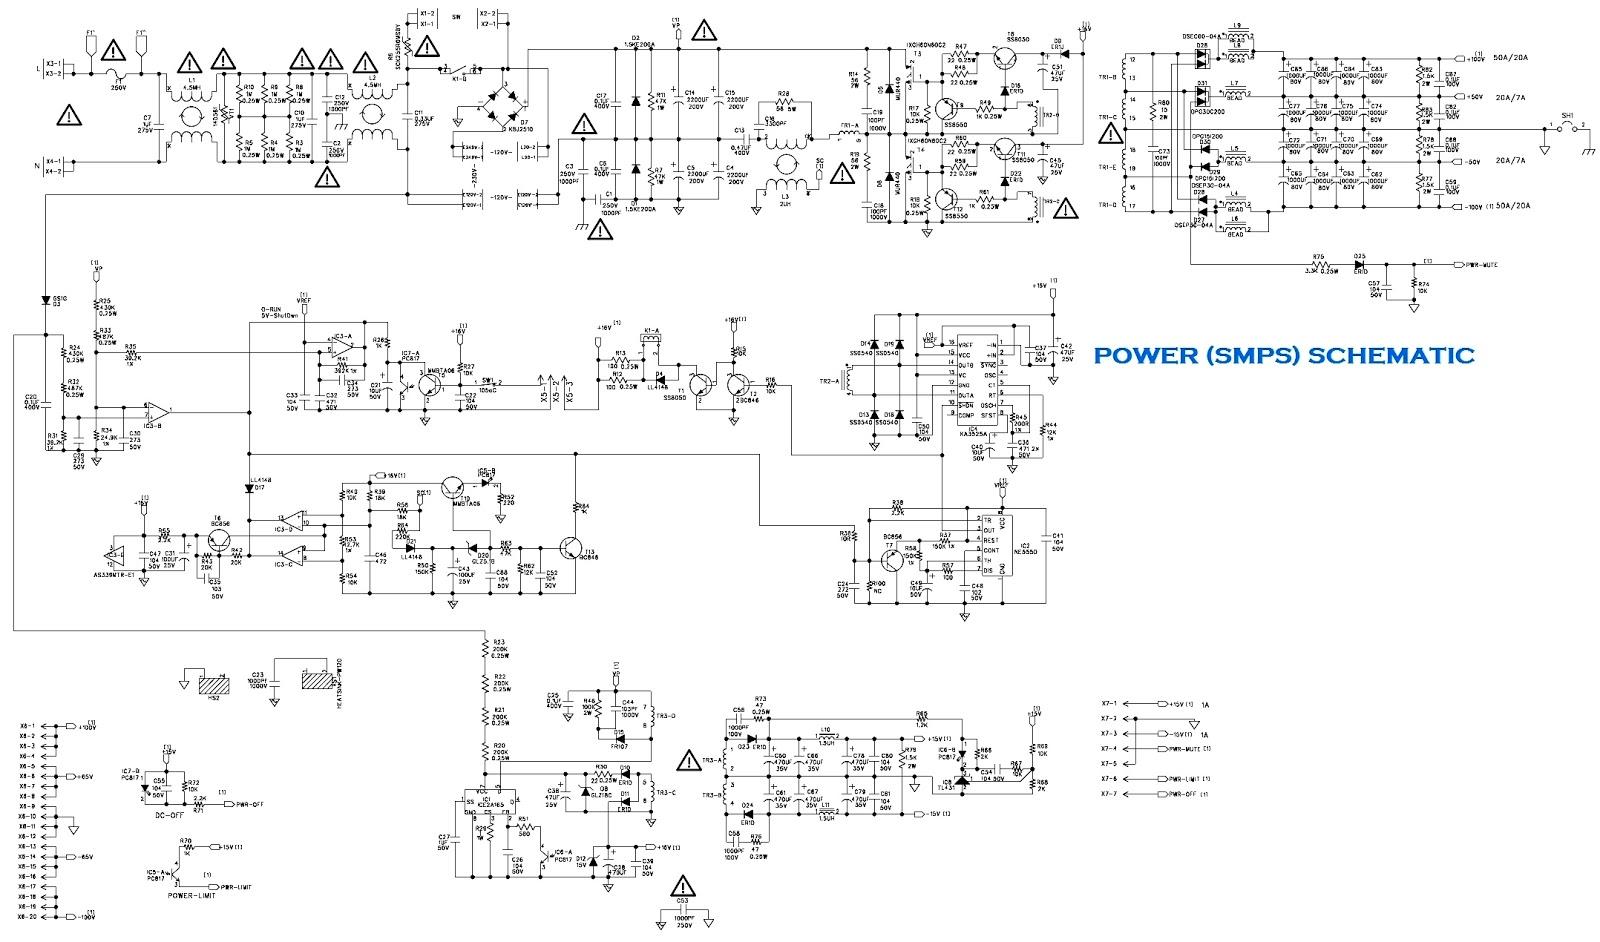 behringer amp schematic behringer epx 3000 - amplifier circuit diagram   schematic ... marshall amp schematic #8